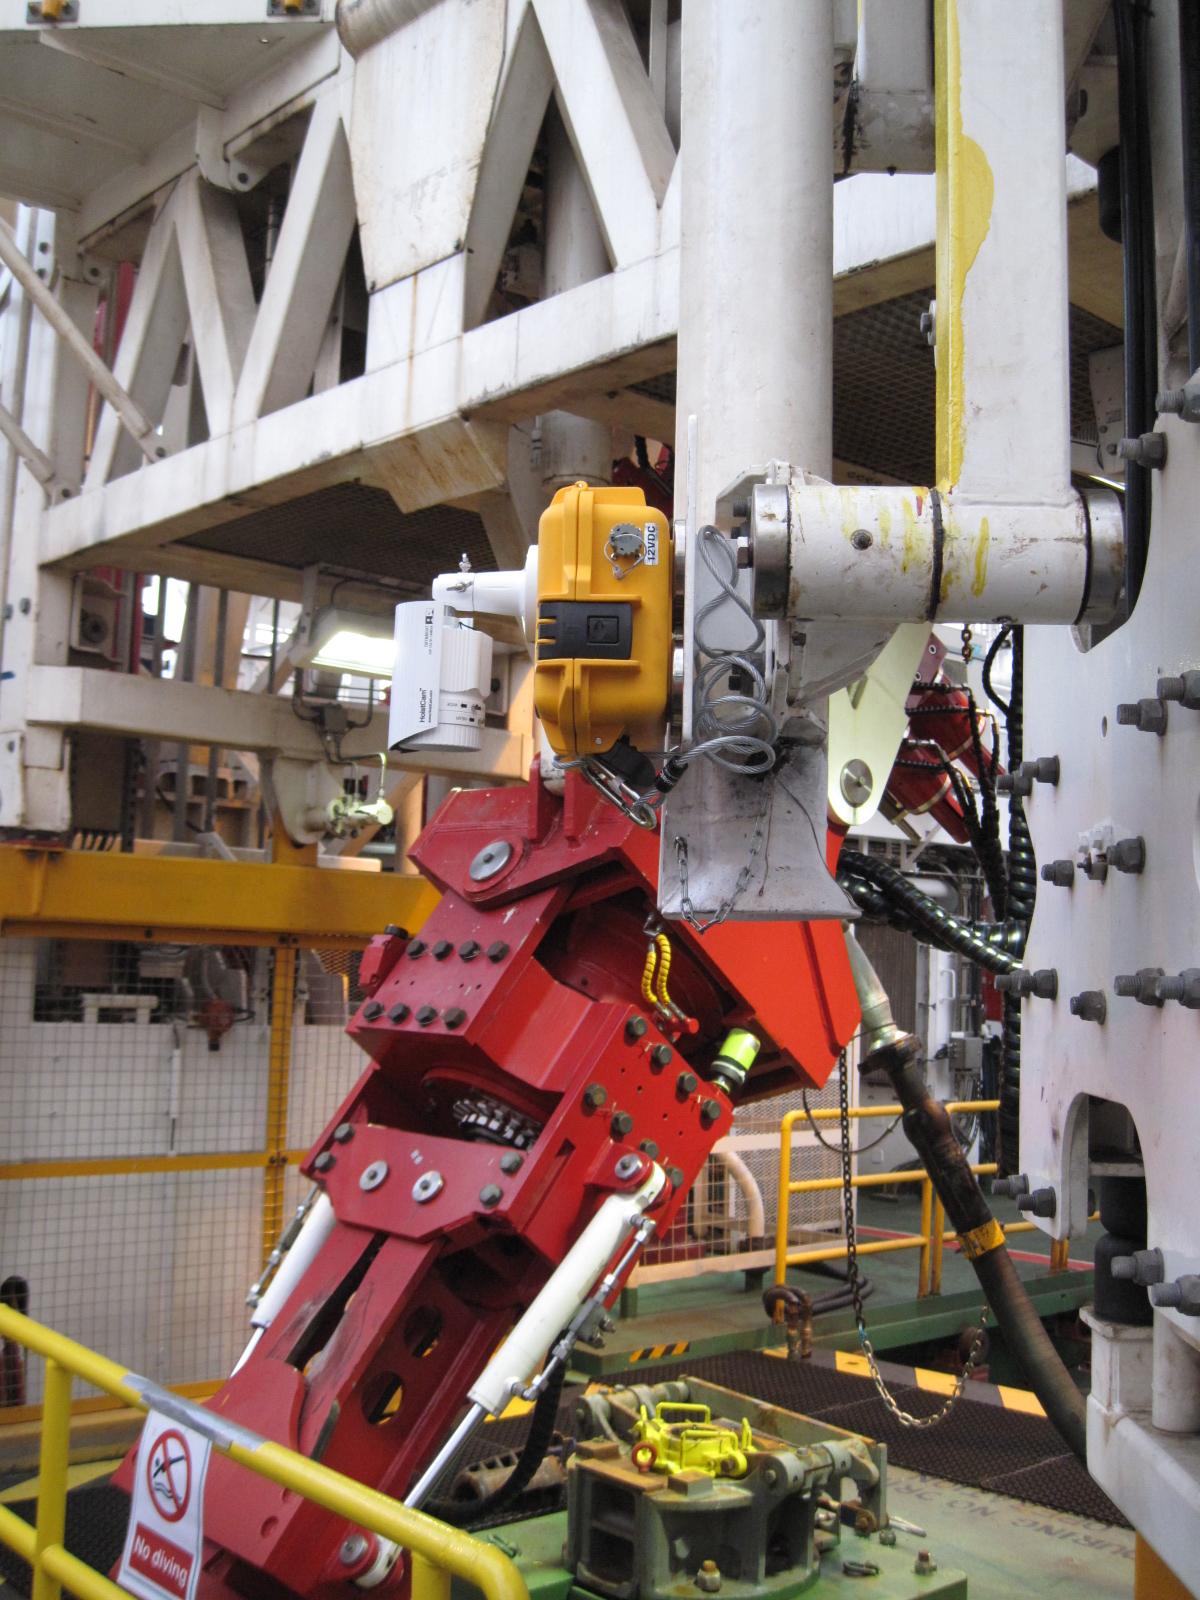 HoistCam™ - Offshore / Drilling Rig / Oil Rig Camera System